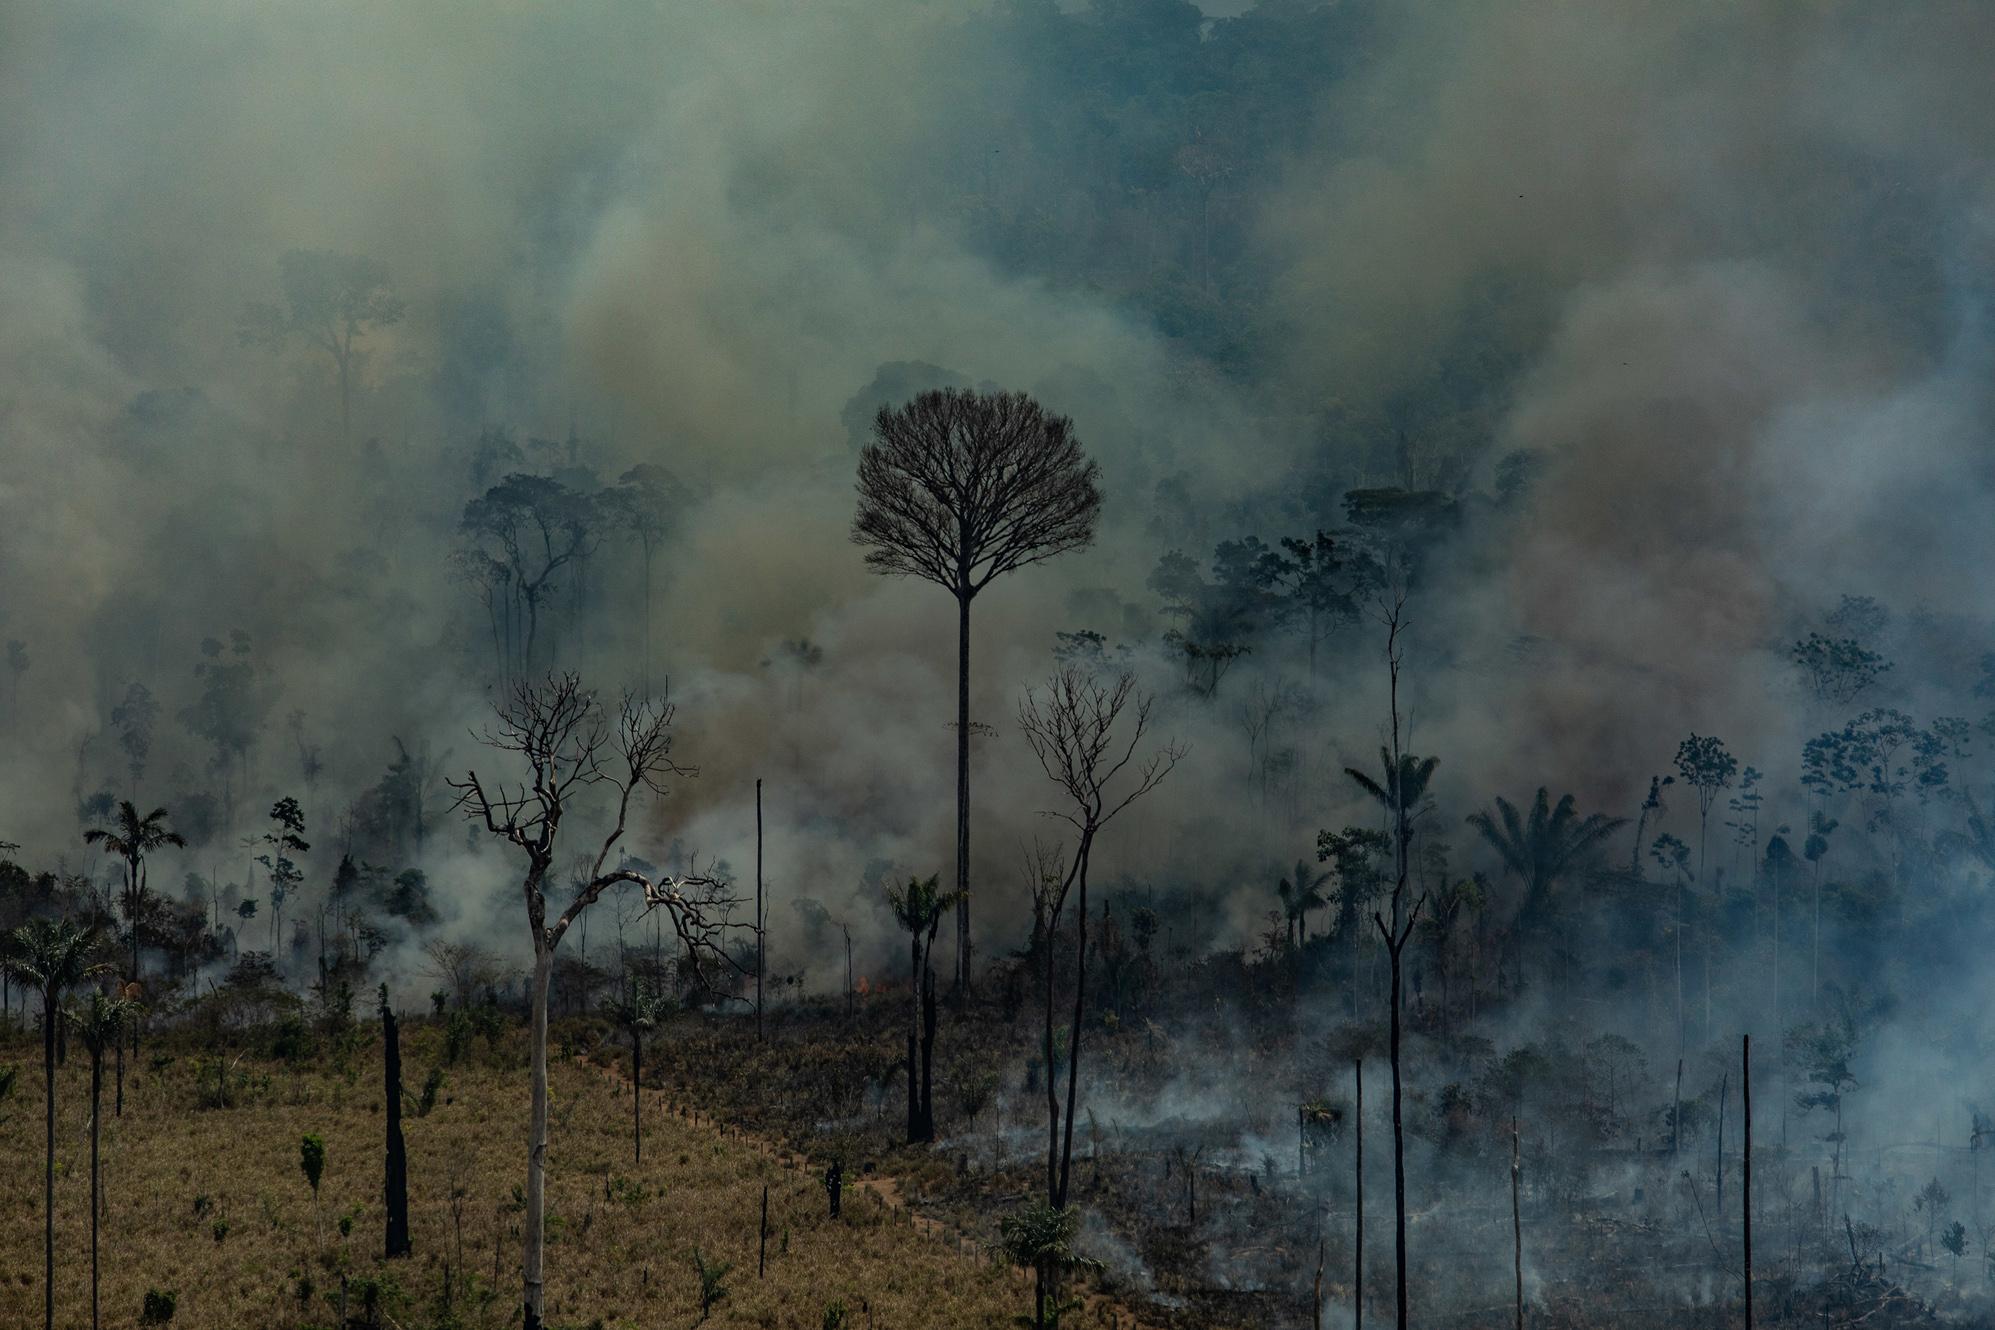 https://amazoniareal.com.br/wp-content/uploads/2019/08/Queimadas-Amaz%C3%B4nia-agosto-2019-Foto-Victor-Moriyama_Greenpeace-31.jpg